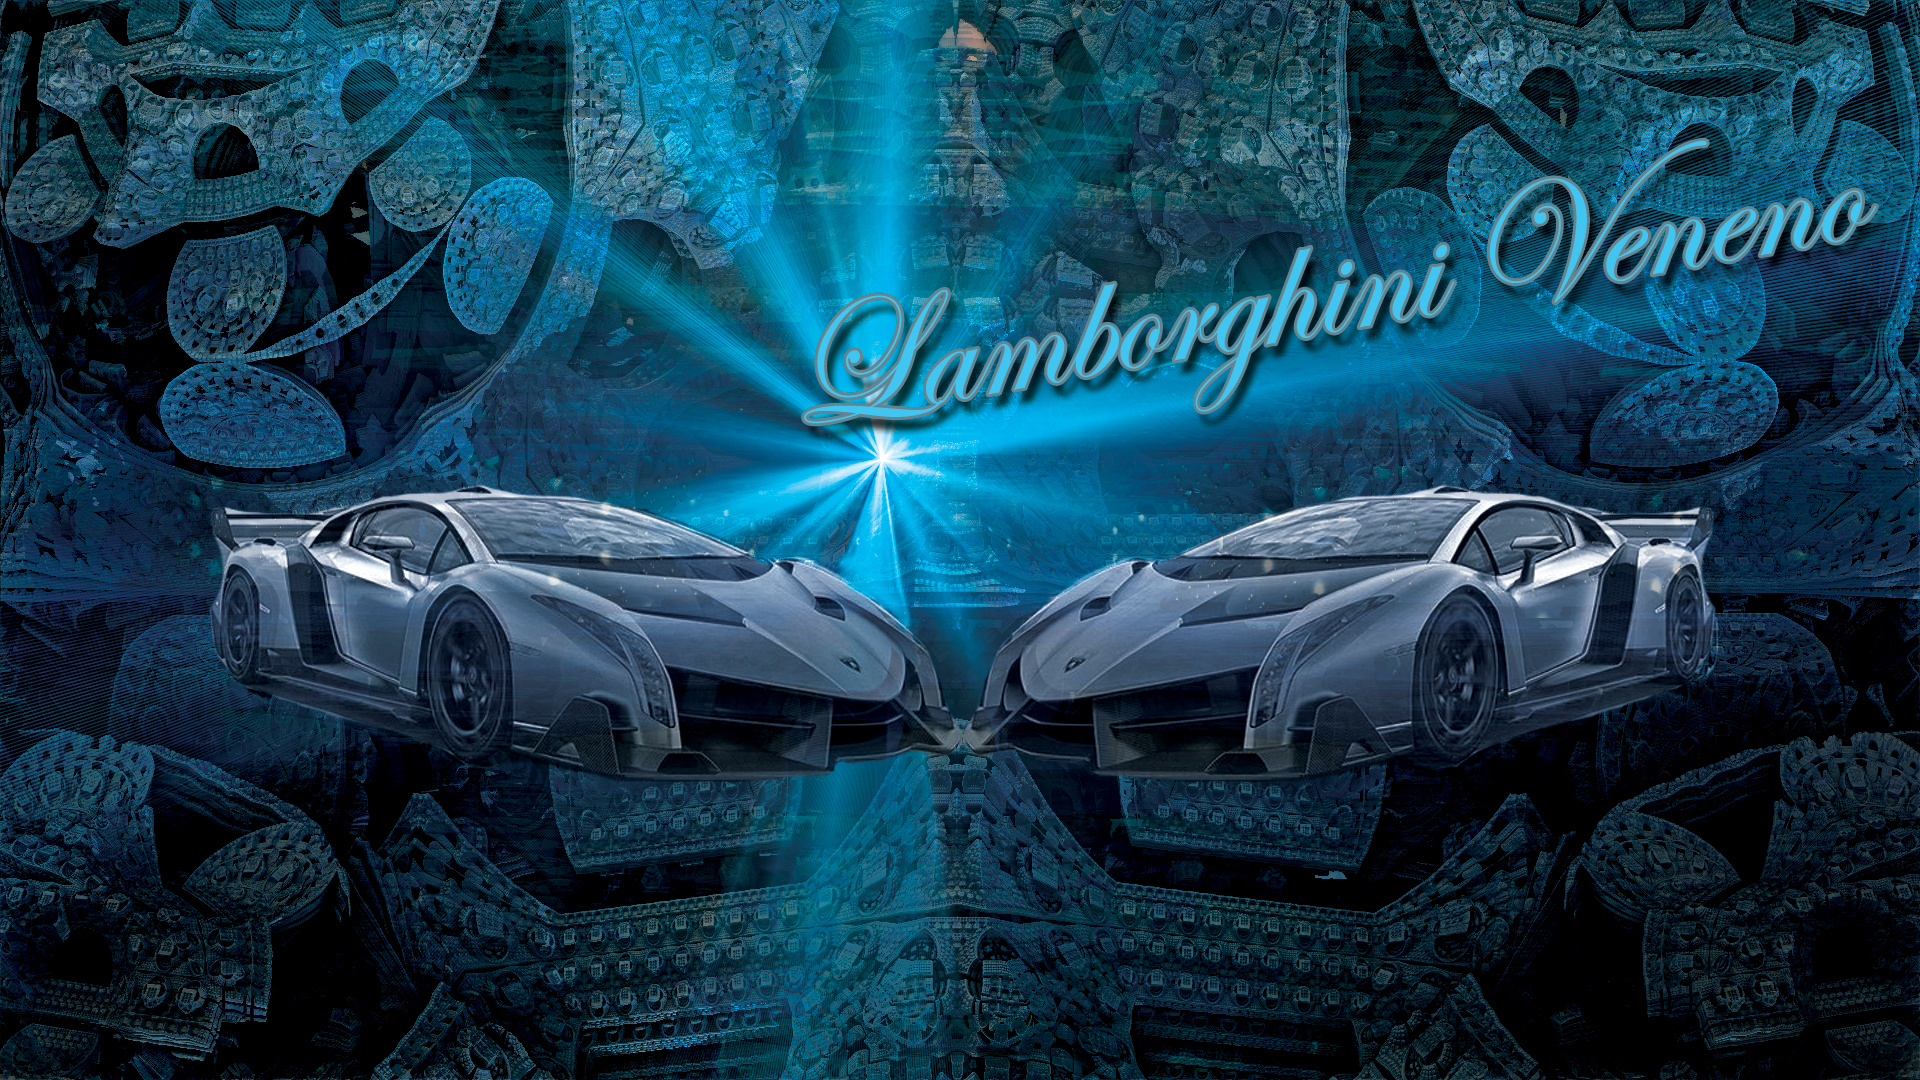 Lamborghini veneno by Topas2012